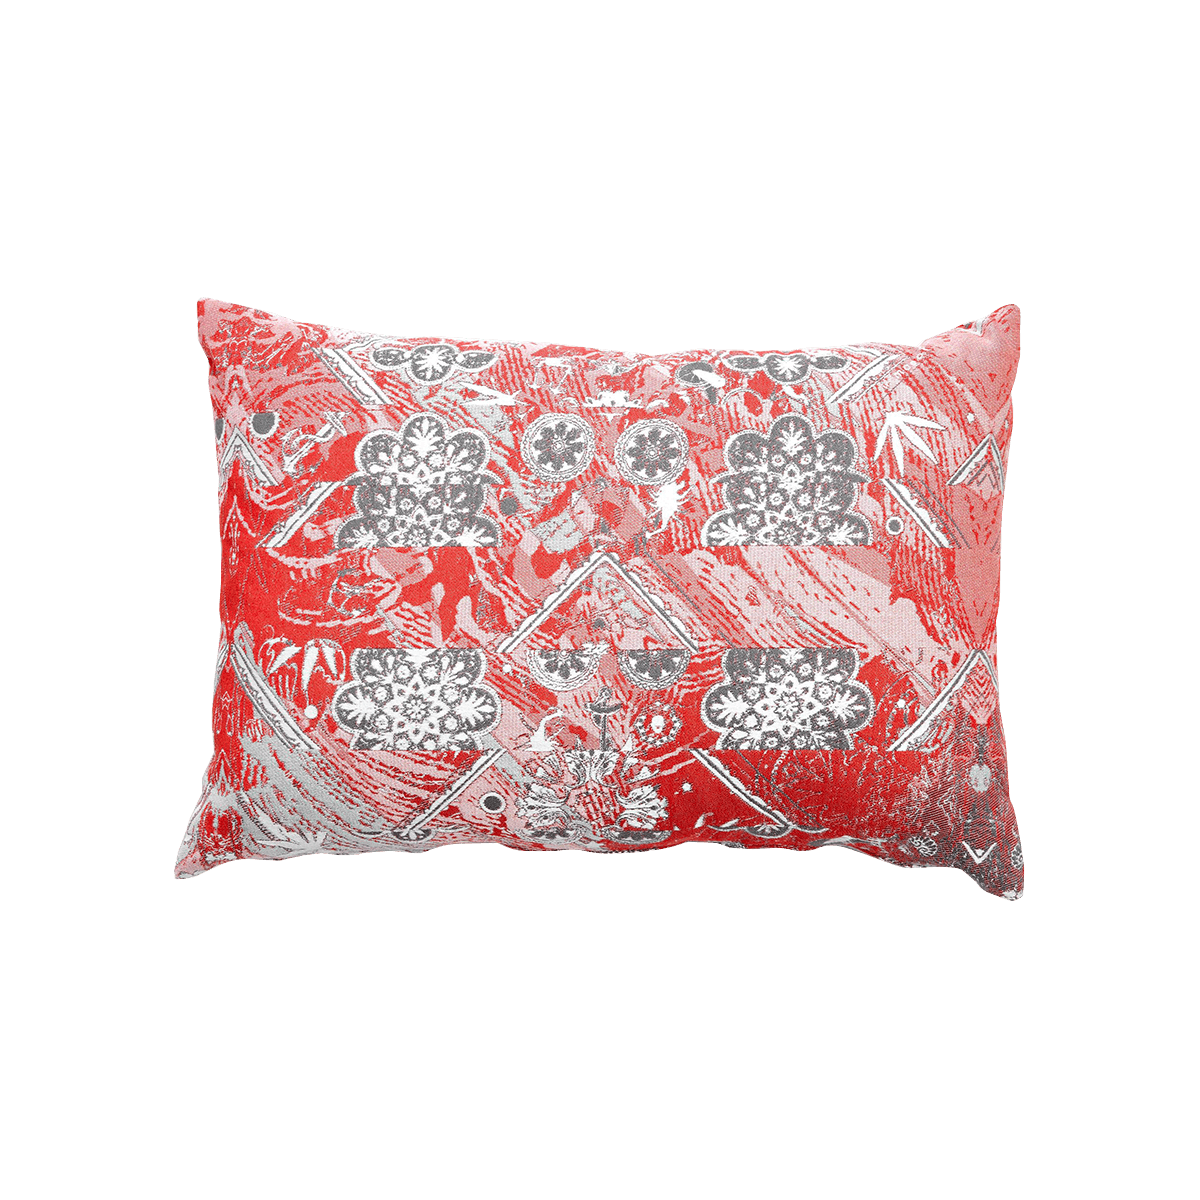 Moooi  Heritage & Oil Pillows 枕头